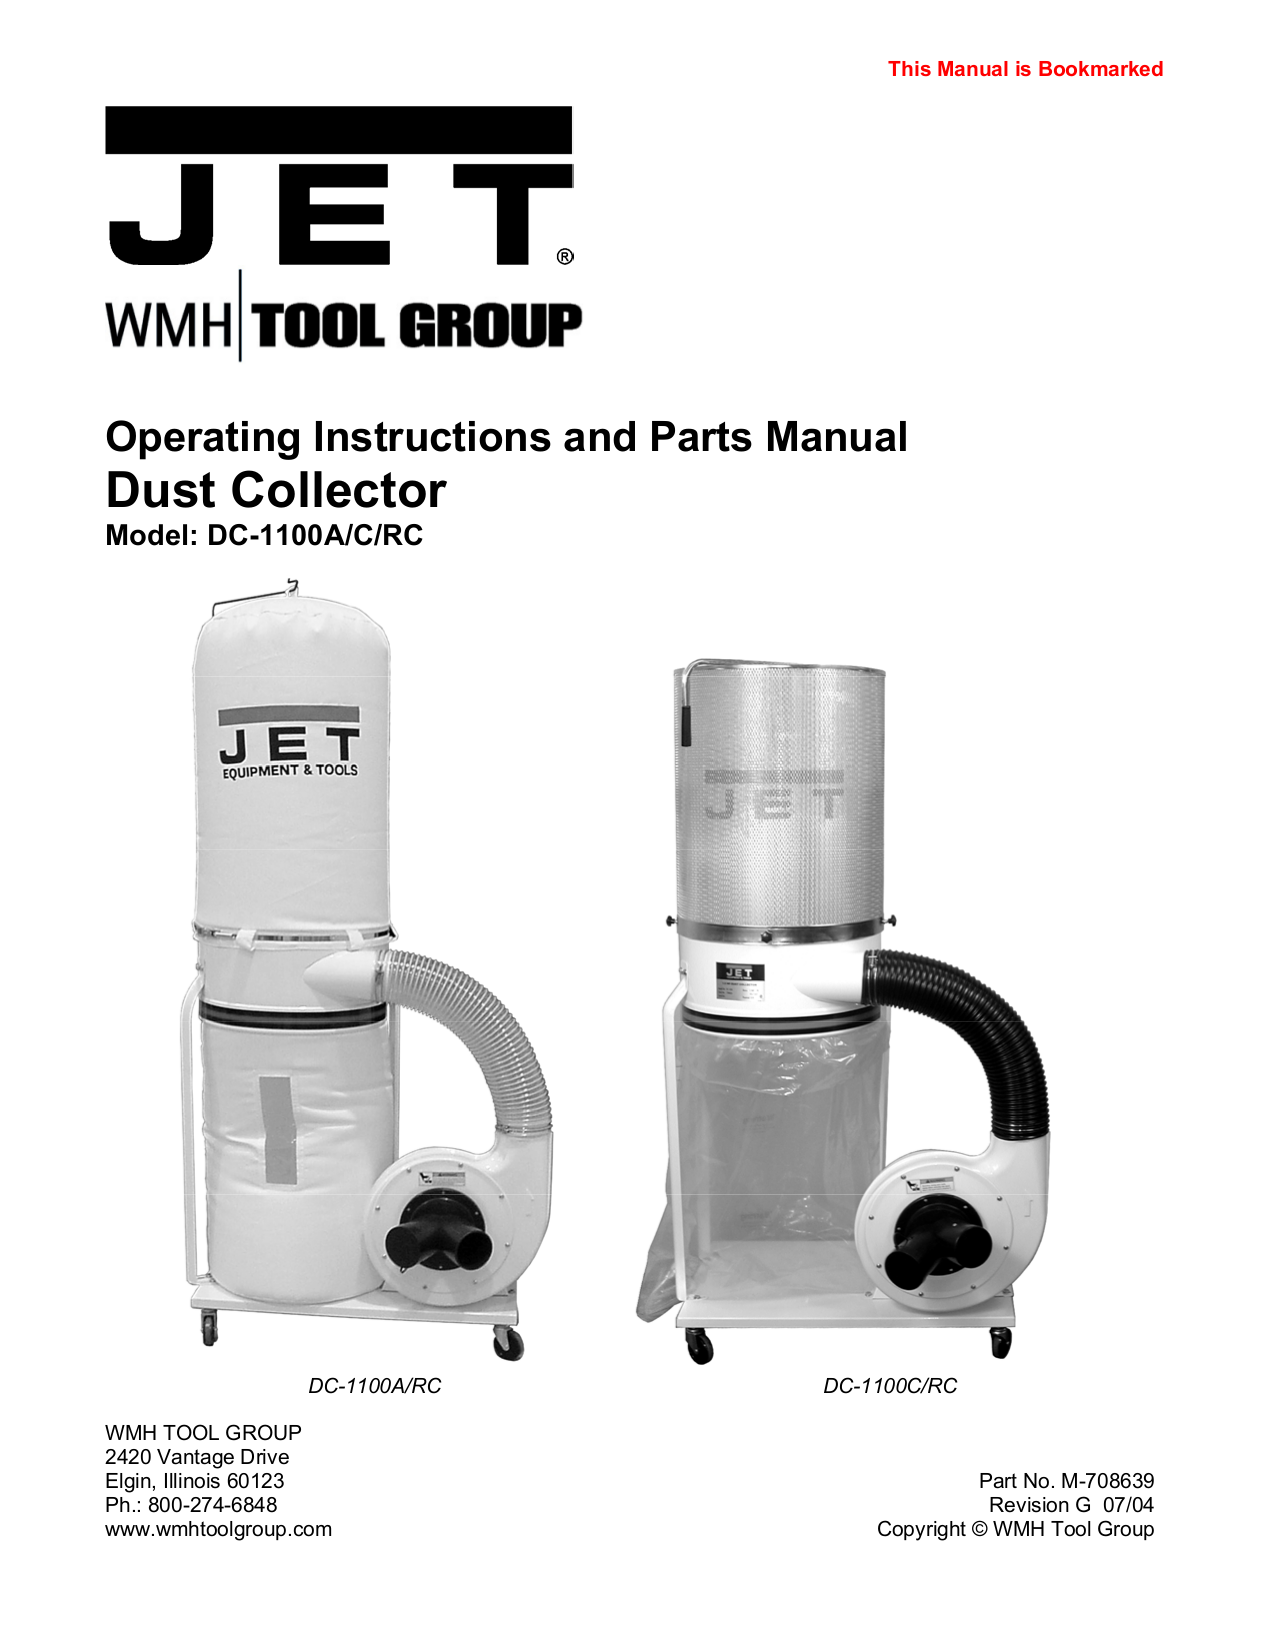 pdf for Jet Vacuum DC-1100A manual